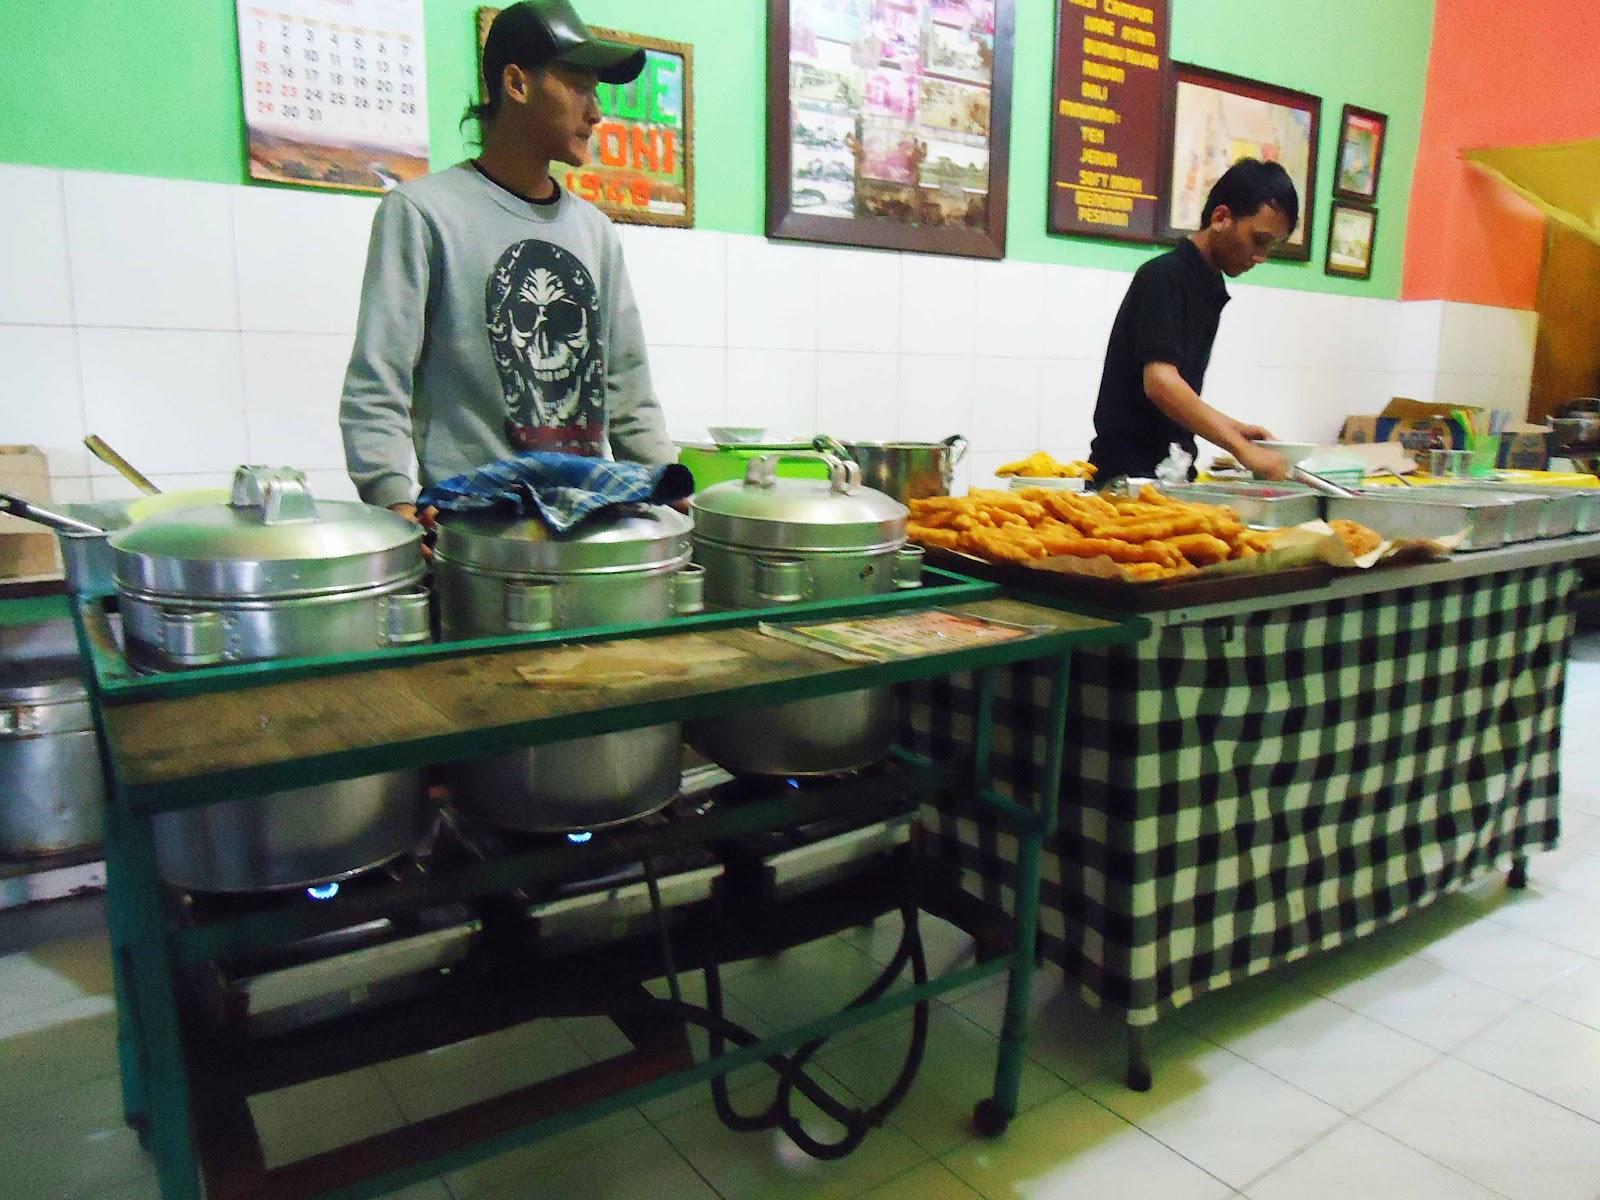 Ronde Titoni, Ronde Titoni Malang, Kota Malang, Dolan Dolen, Dolaners Ronde Titoni via ririmaulidina - Dolan Dolen